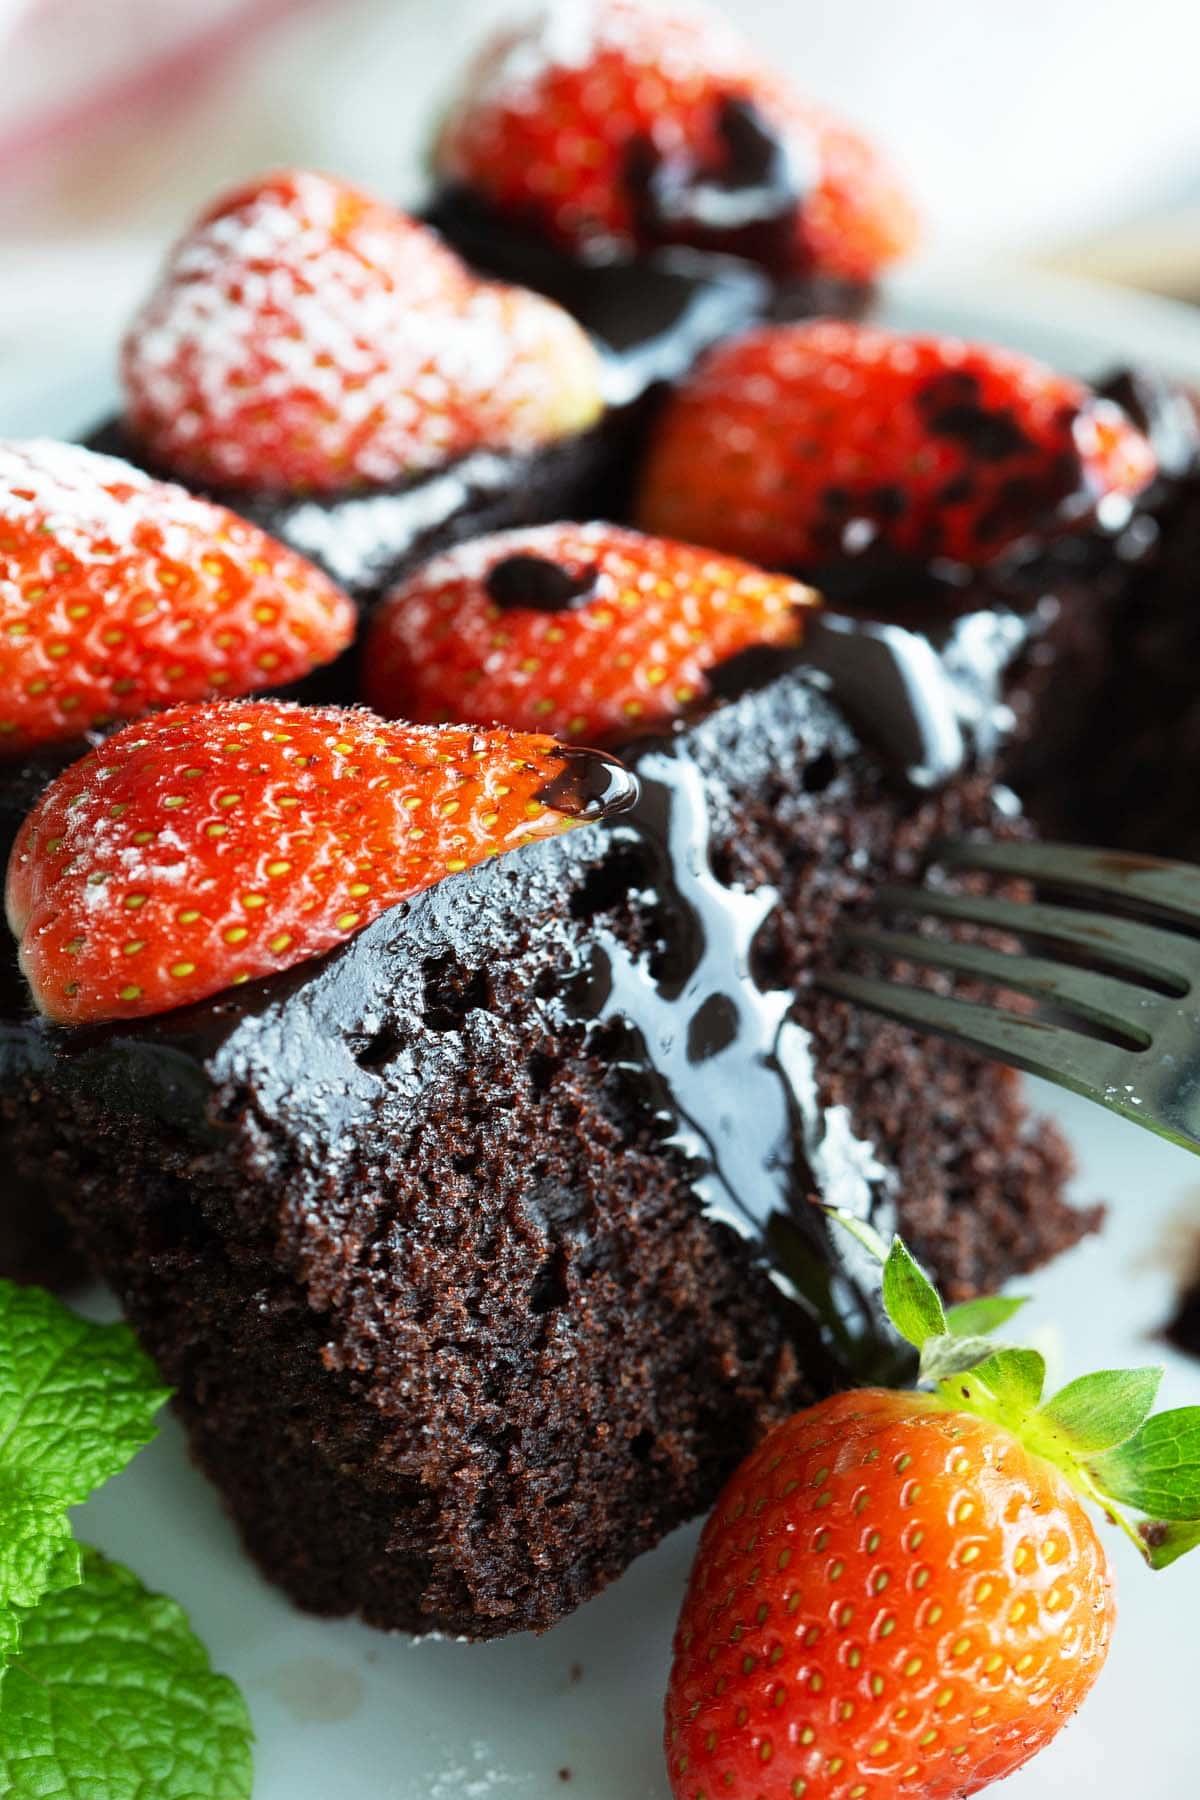 Moist chocolate cake on a plate.